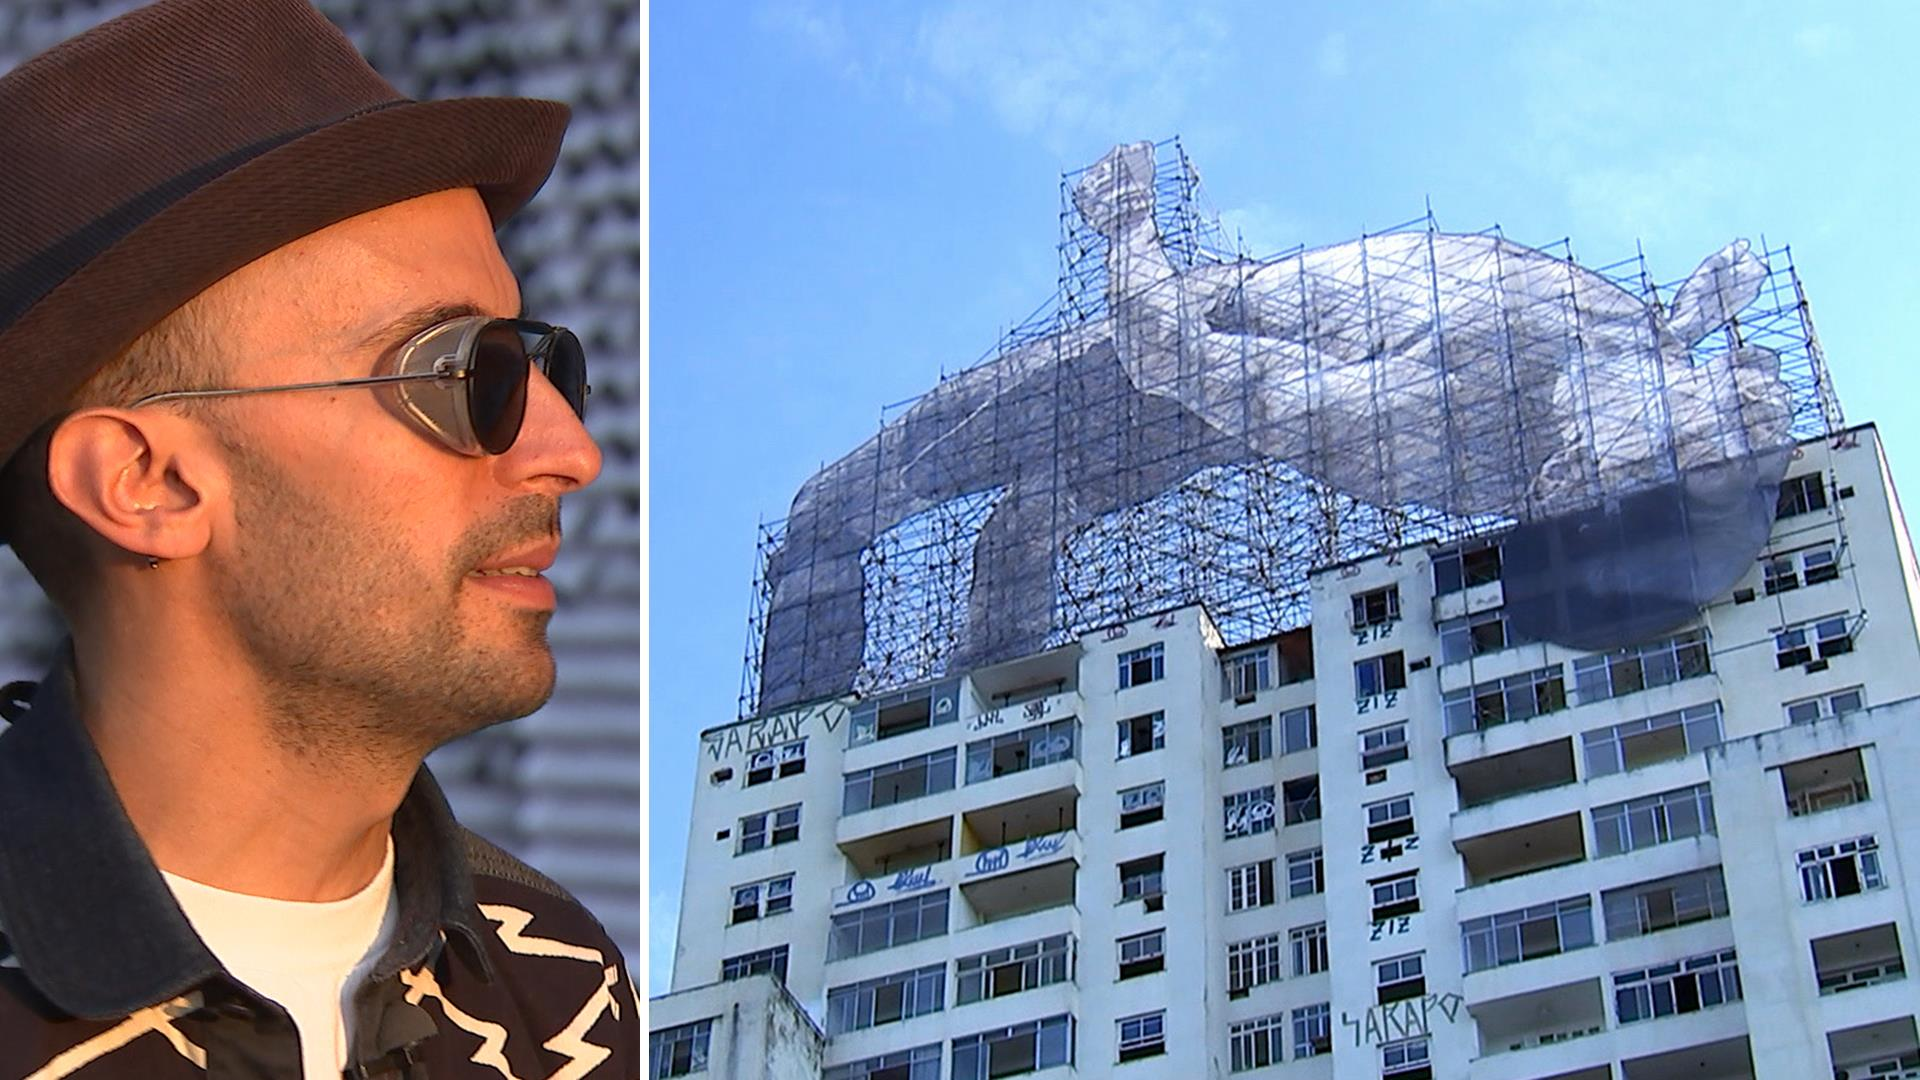 Meet JR, the semi-anonymous street artist behind Rios massive art project